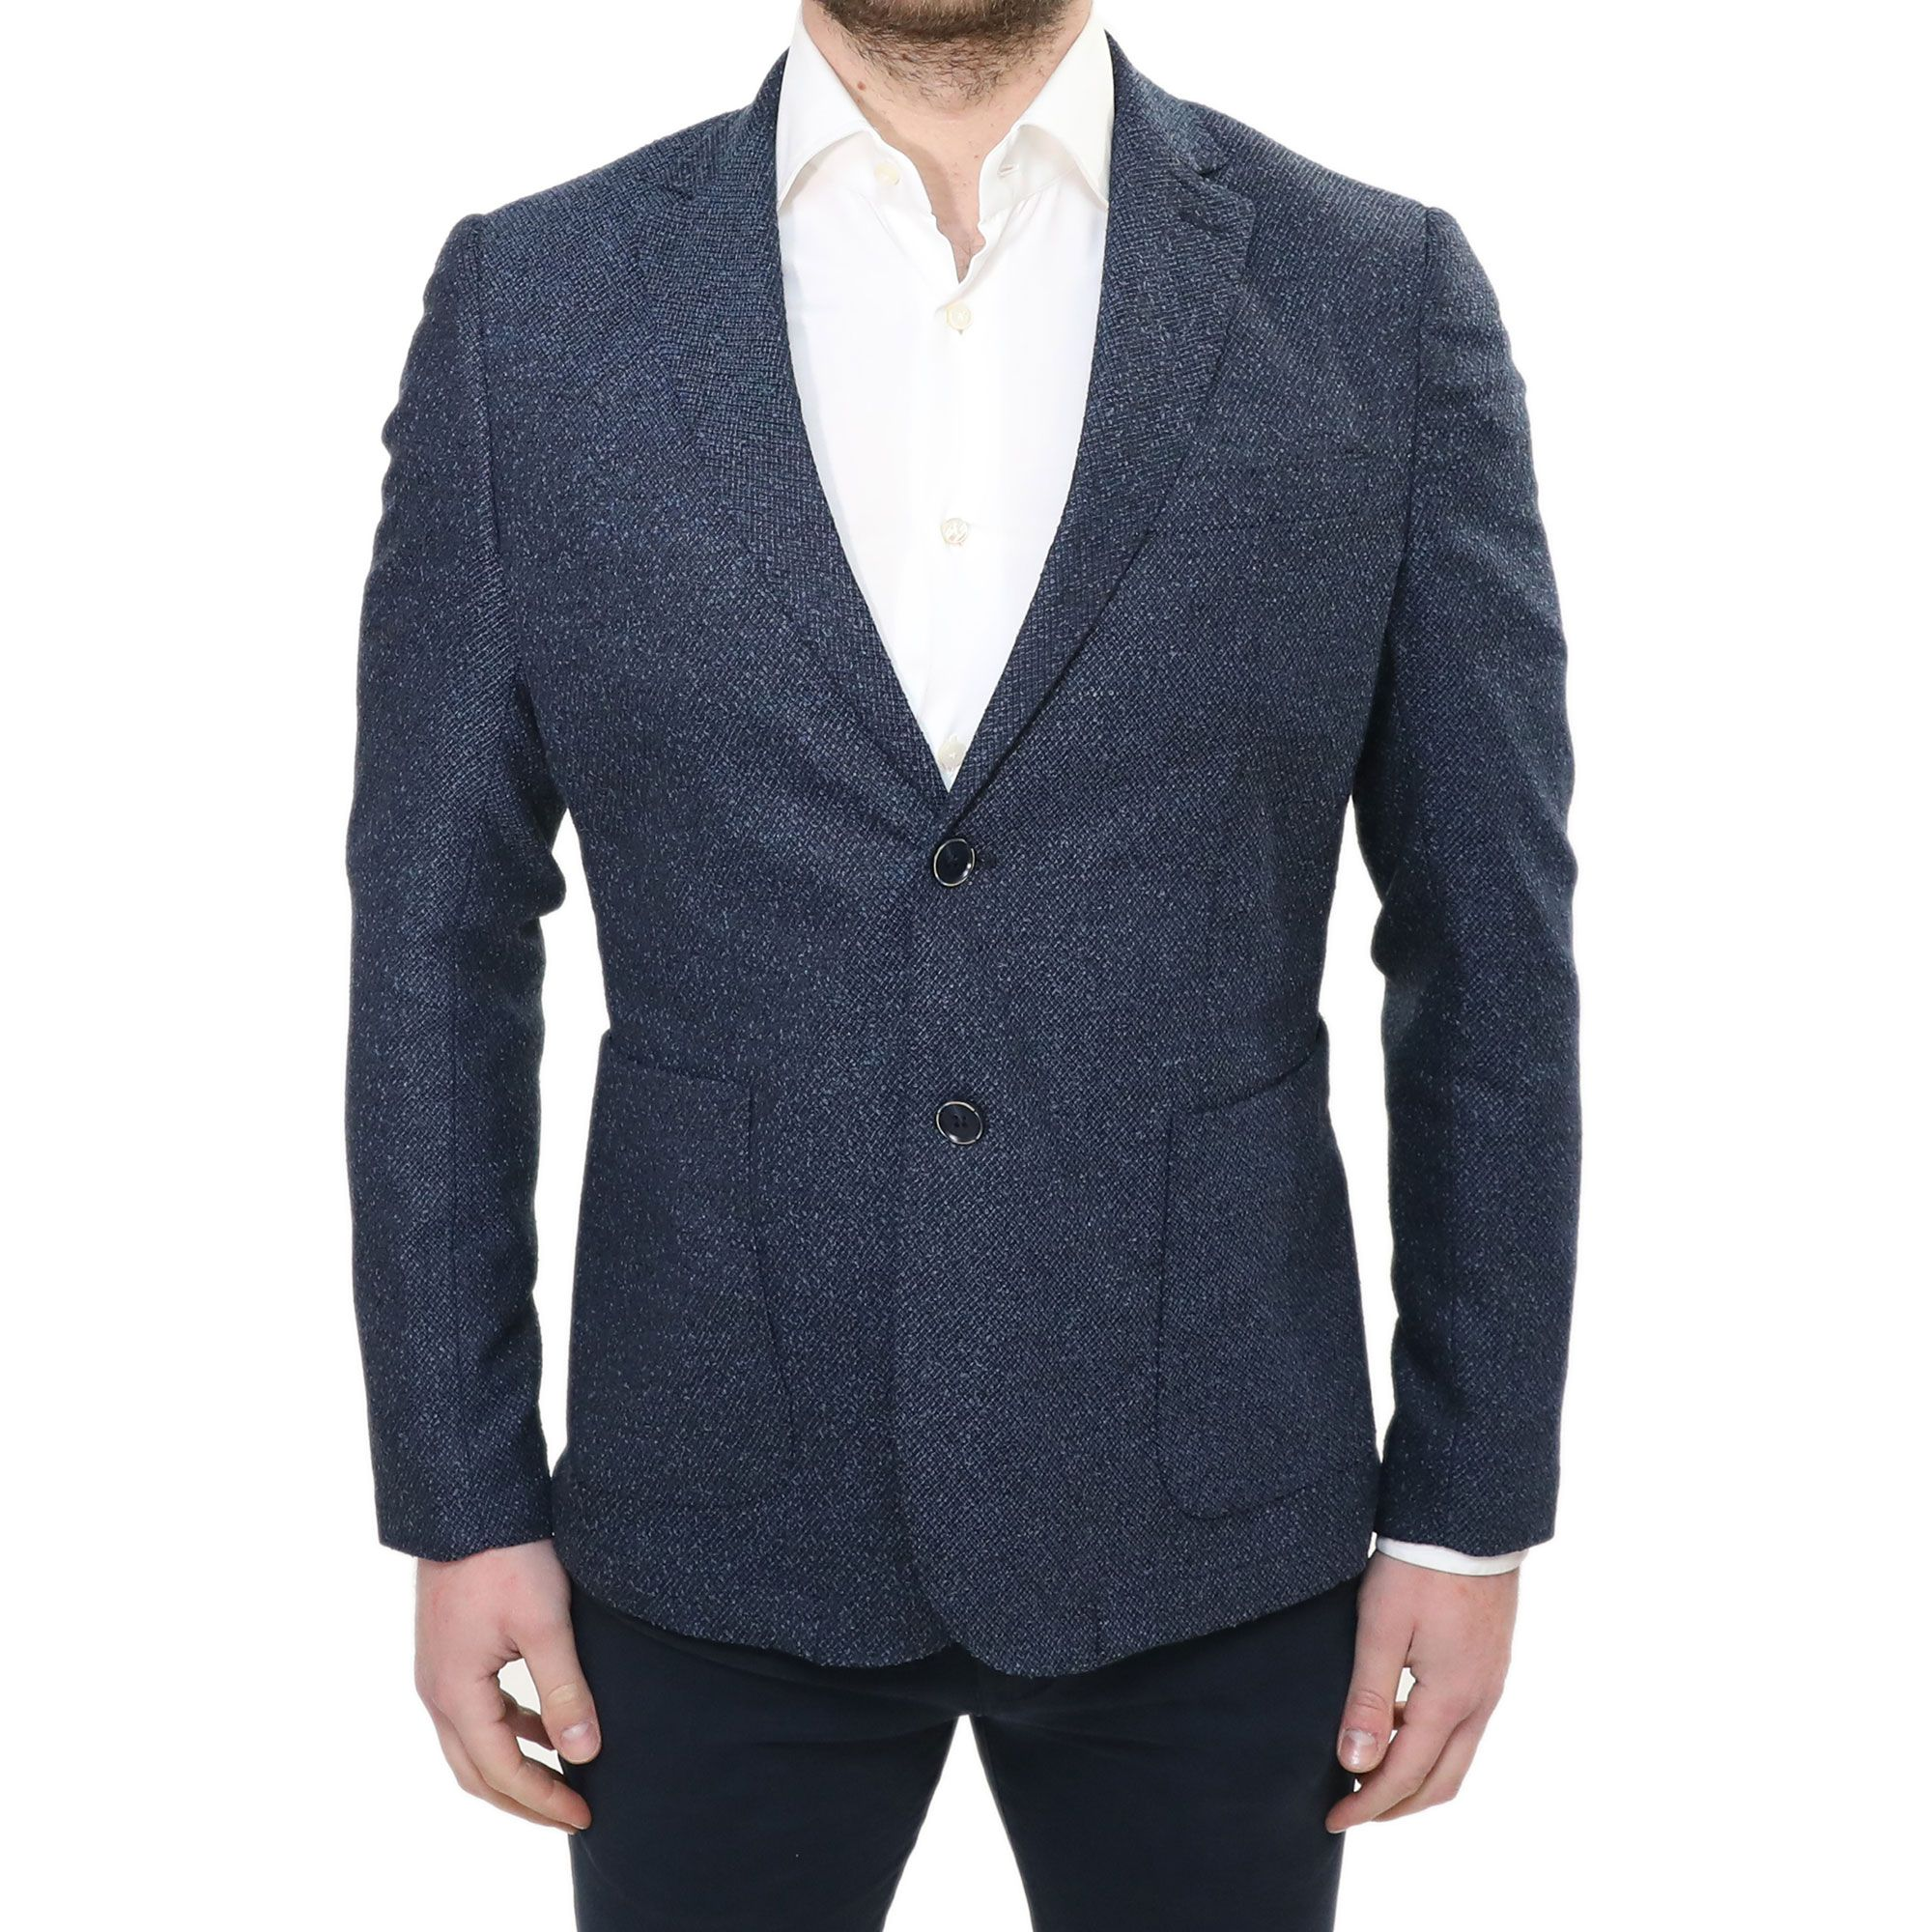 Giacca Blazer Uomo Slim Fit Elegante Invernale Blu Sartoriale In Lana  Sportivo bb4b536575e